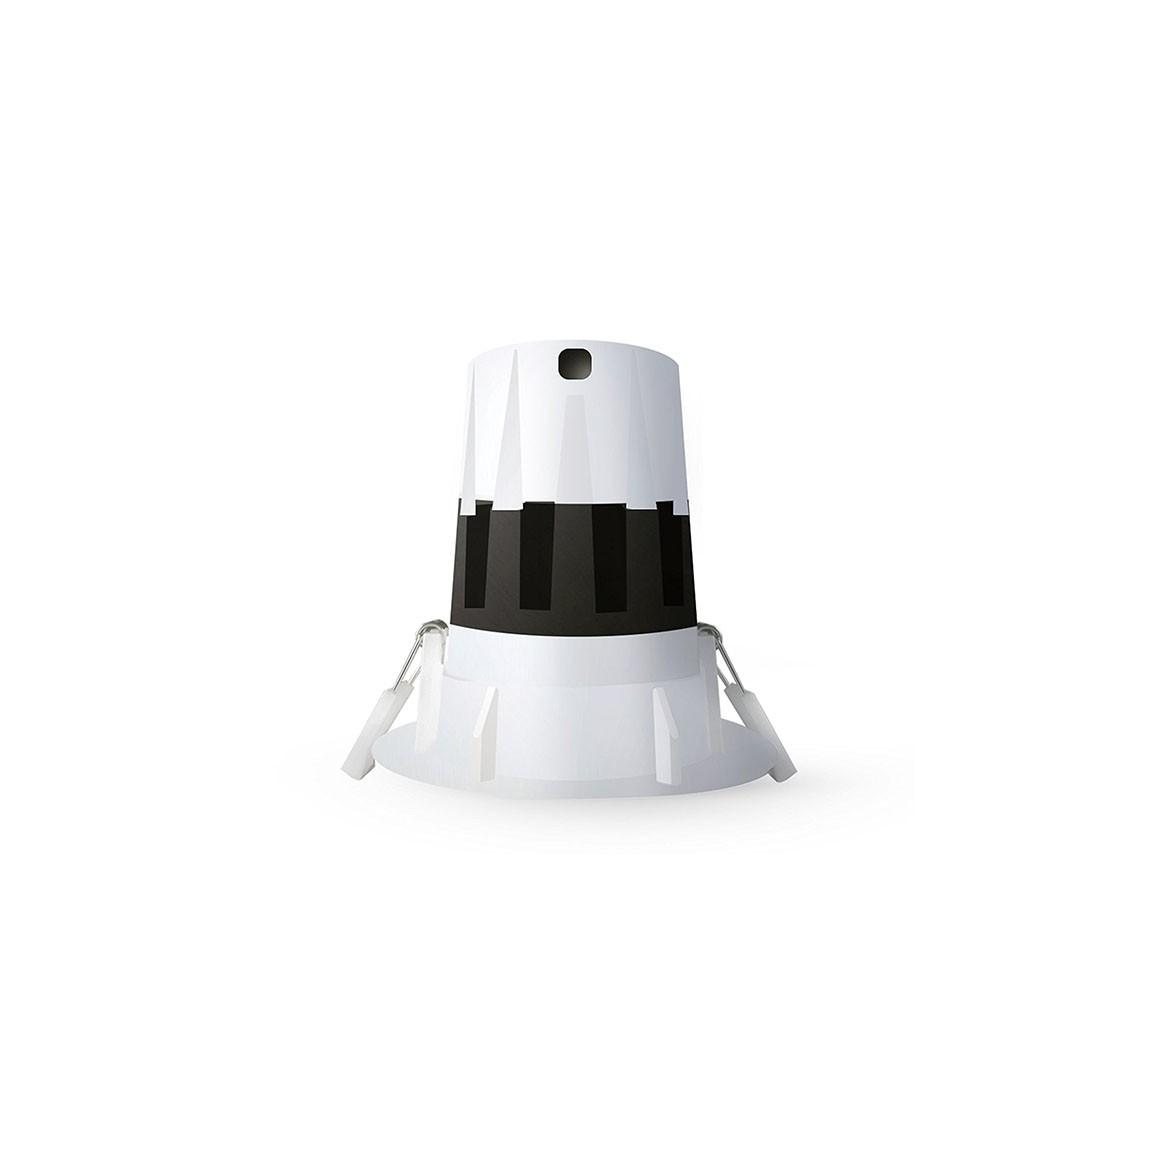 LIFX 100mm Colour and White Wi-Fi Smart LED Dow...